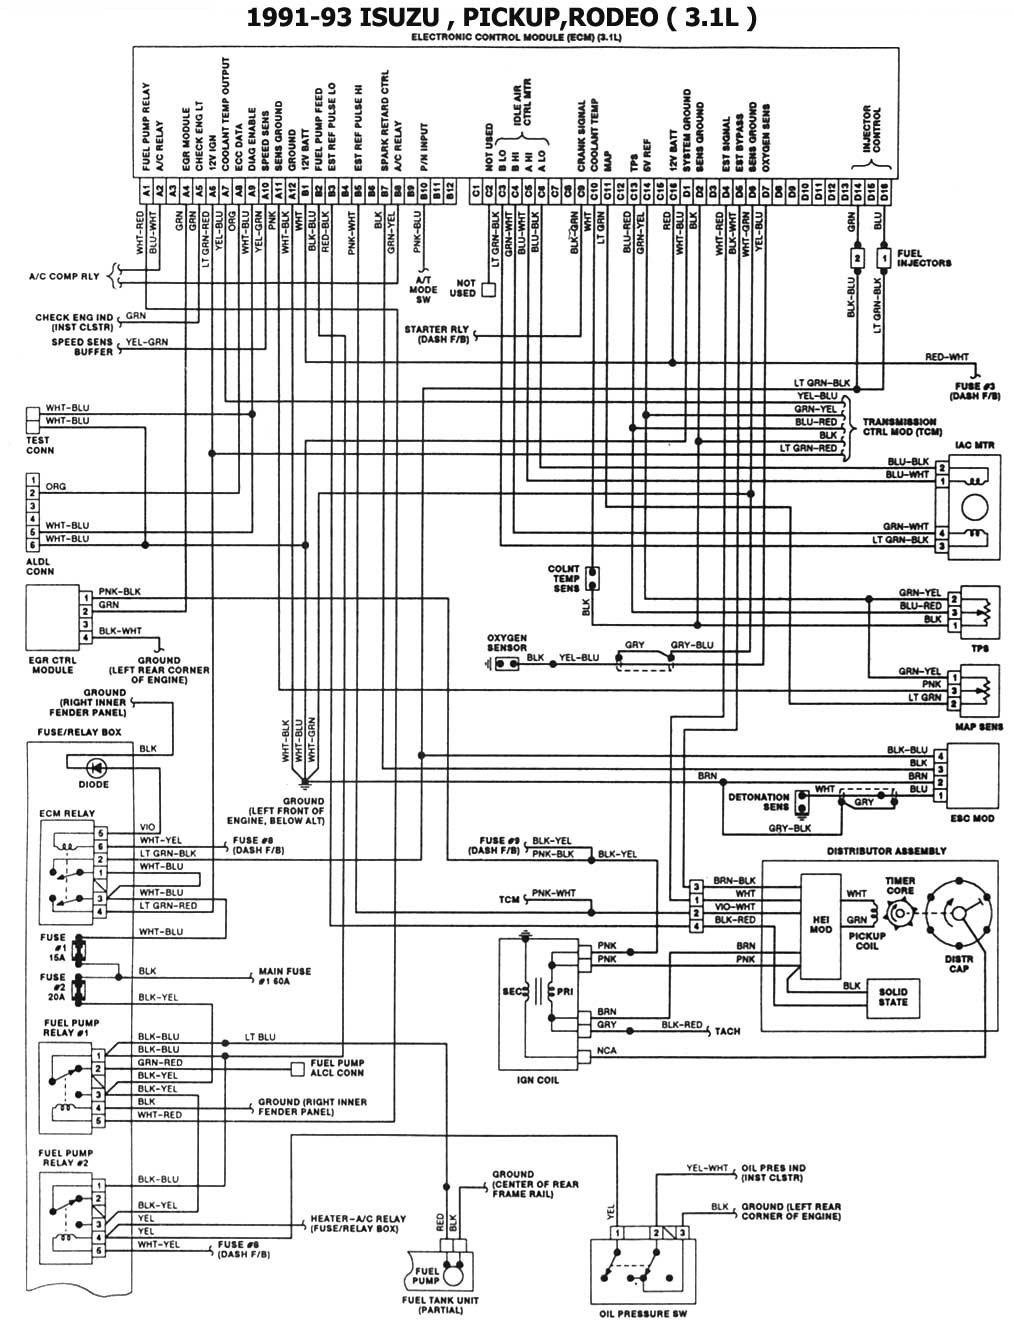 hight resolution of 1991 93 3 1l esquemas electricos rodeo